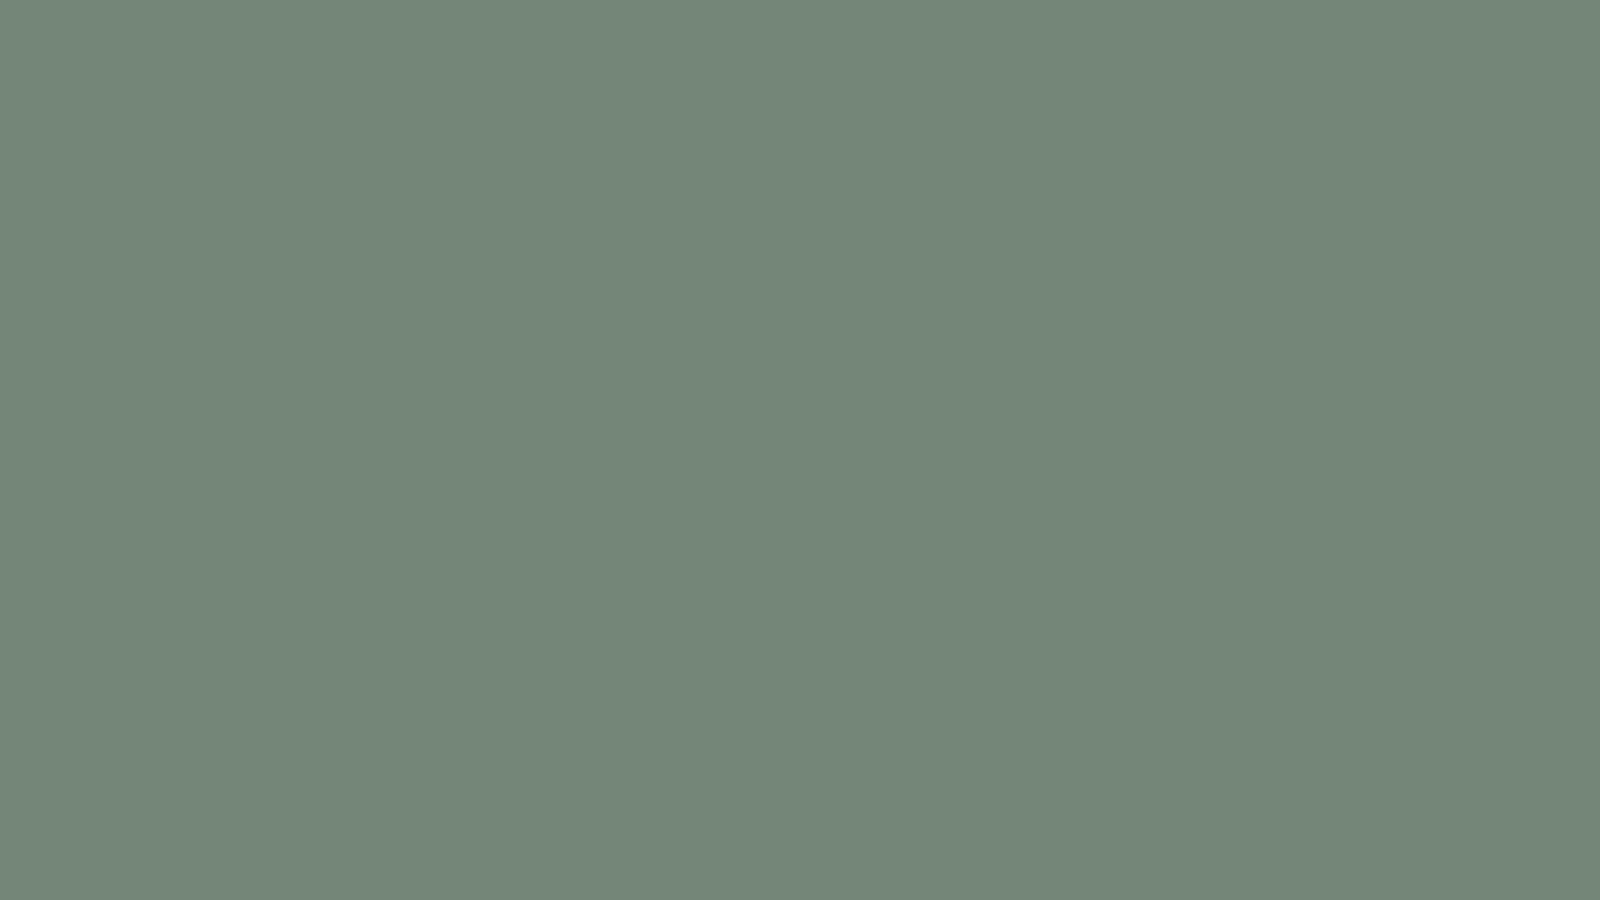 1600x900 Xanadu Solid Color Background